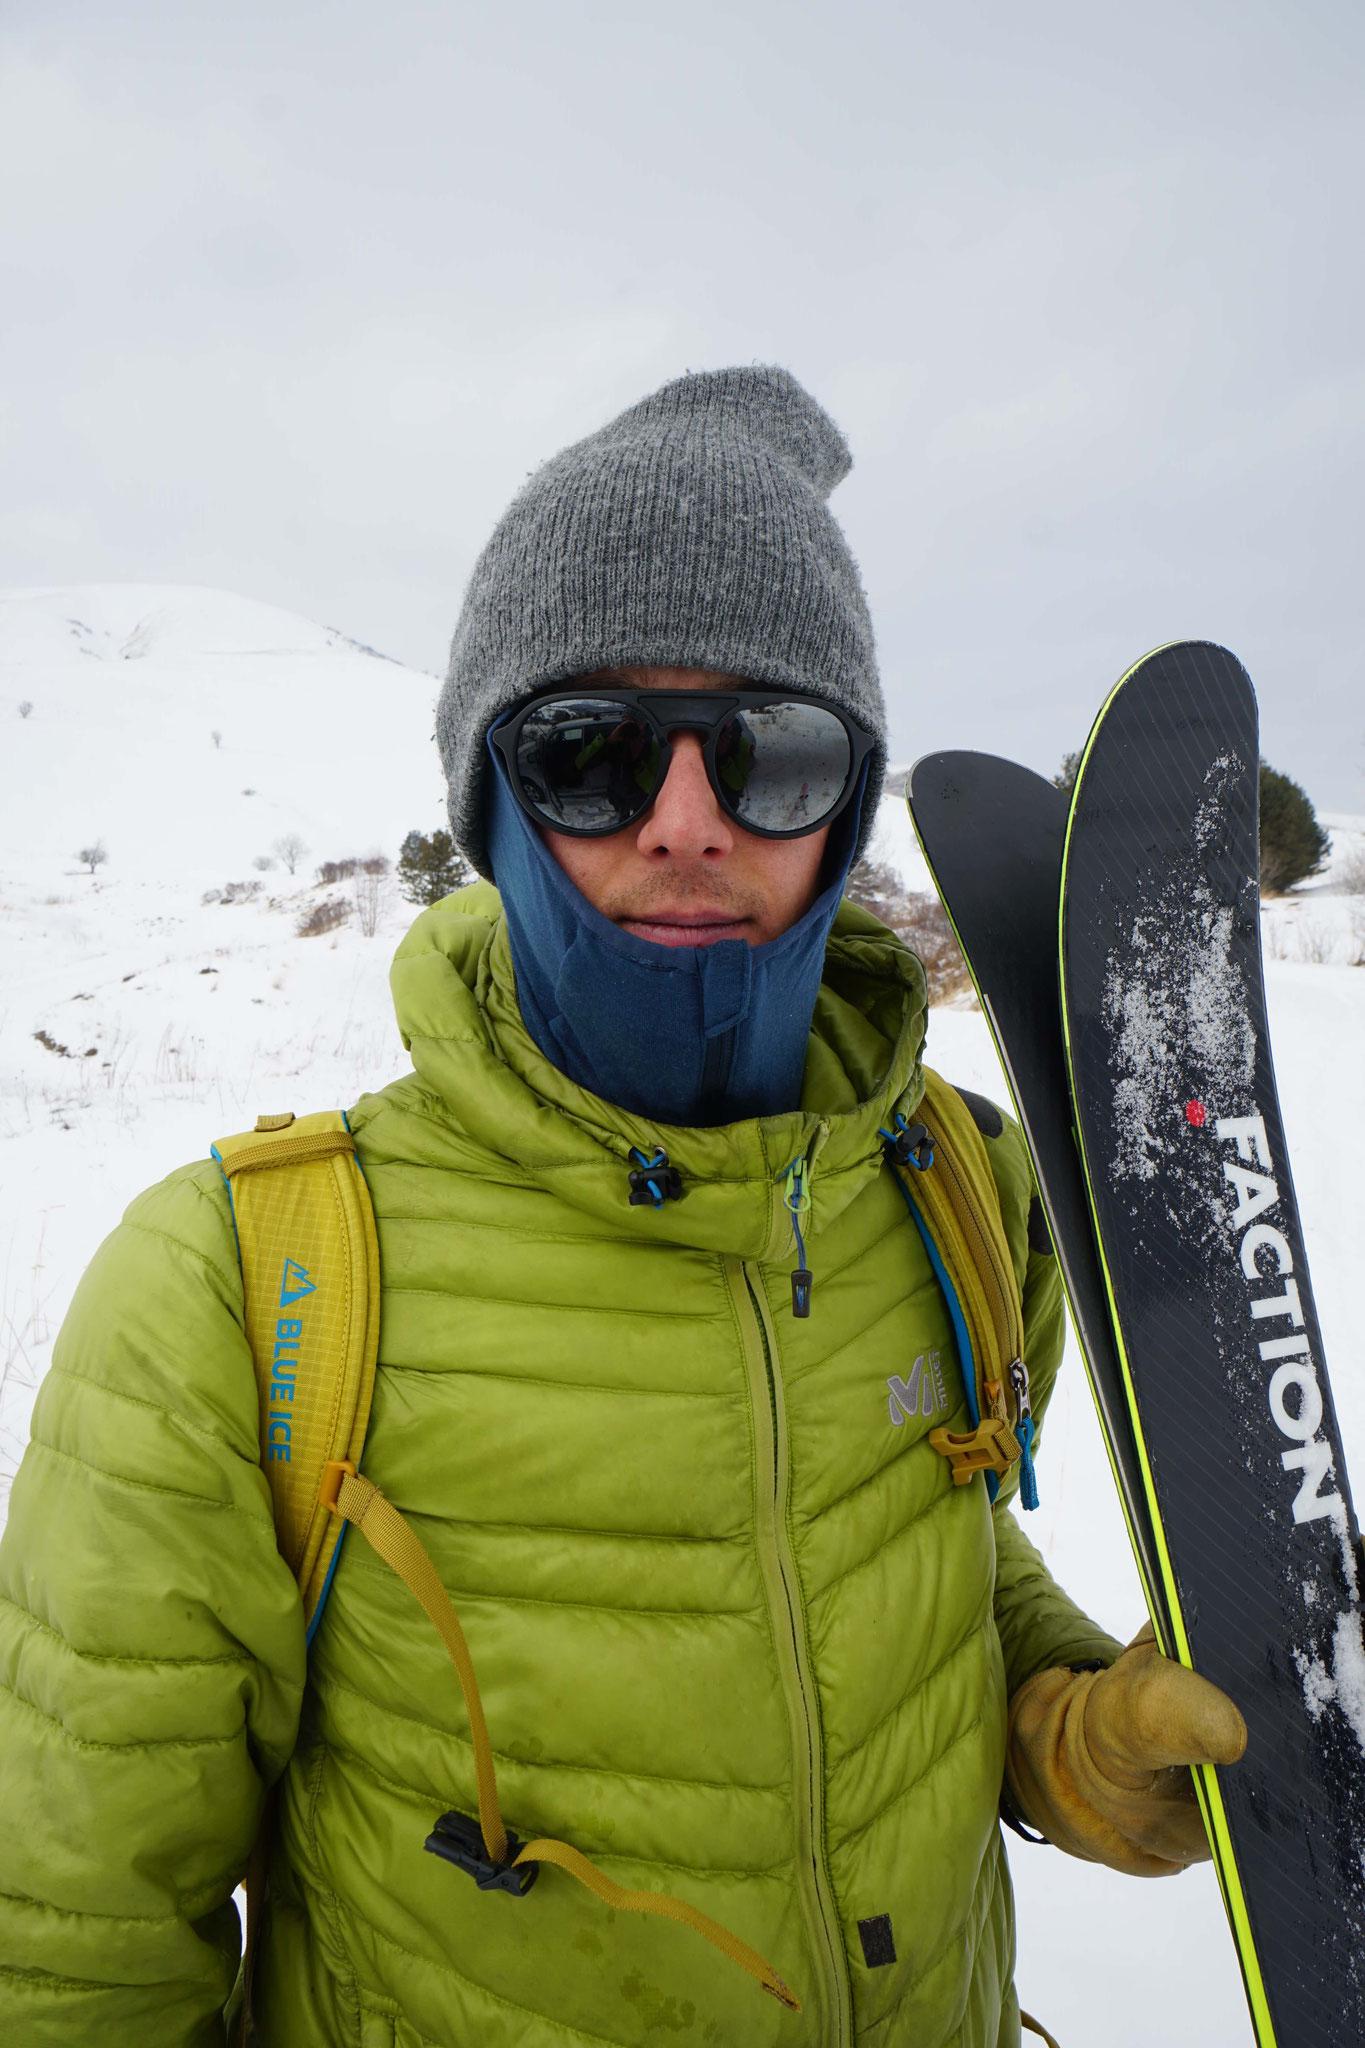 Merci Faction skis